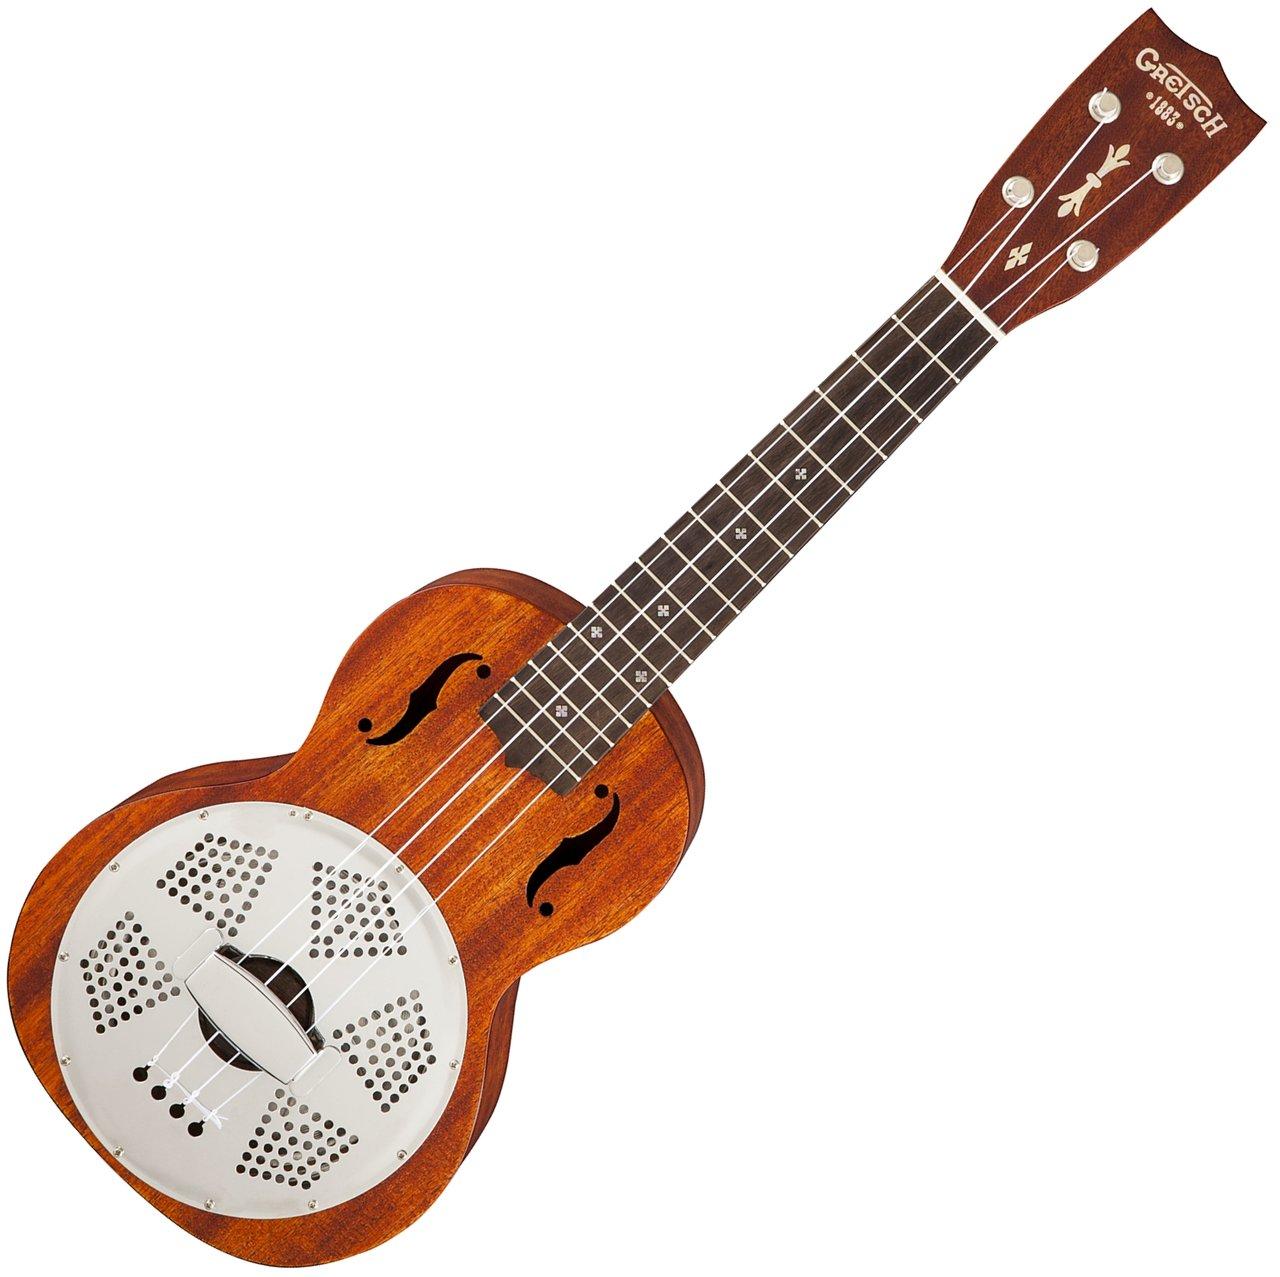 Špeciálne ukulele